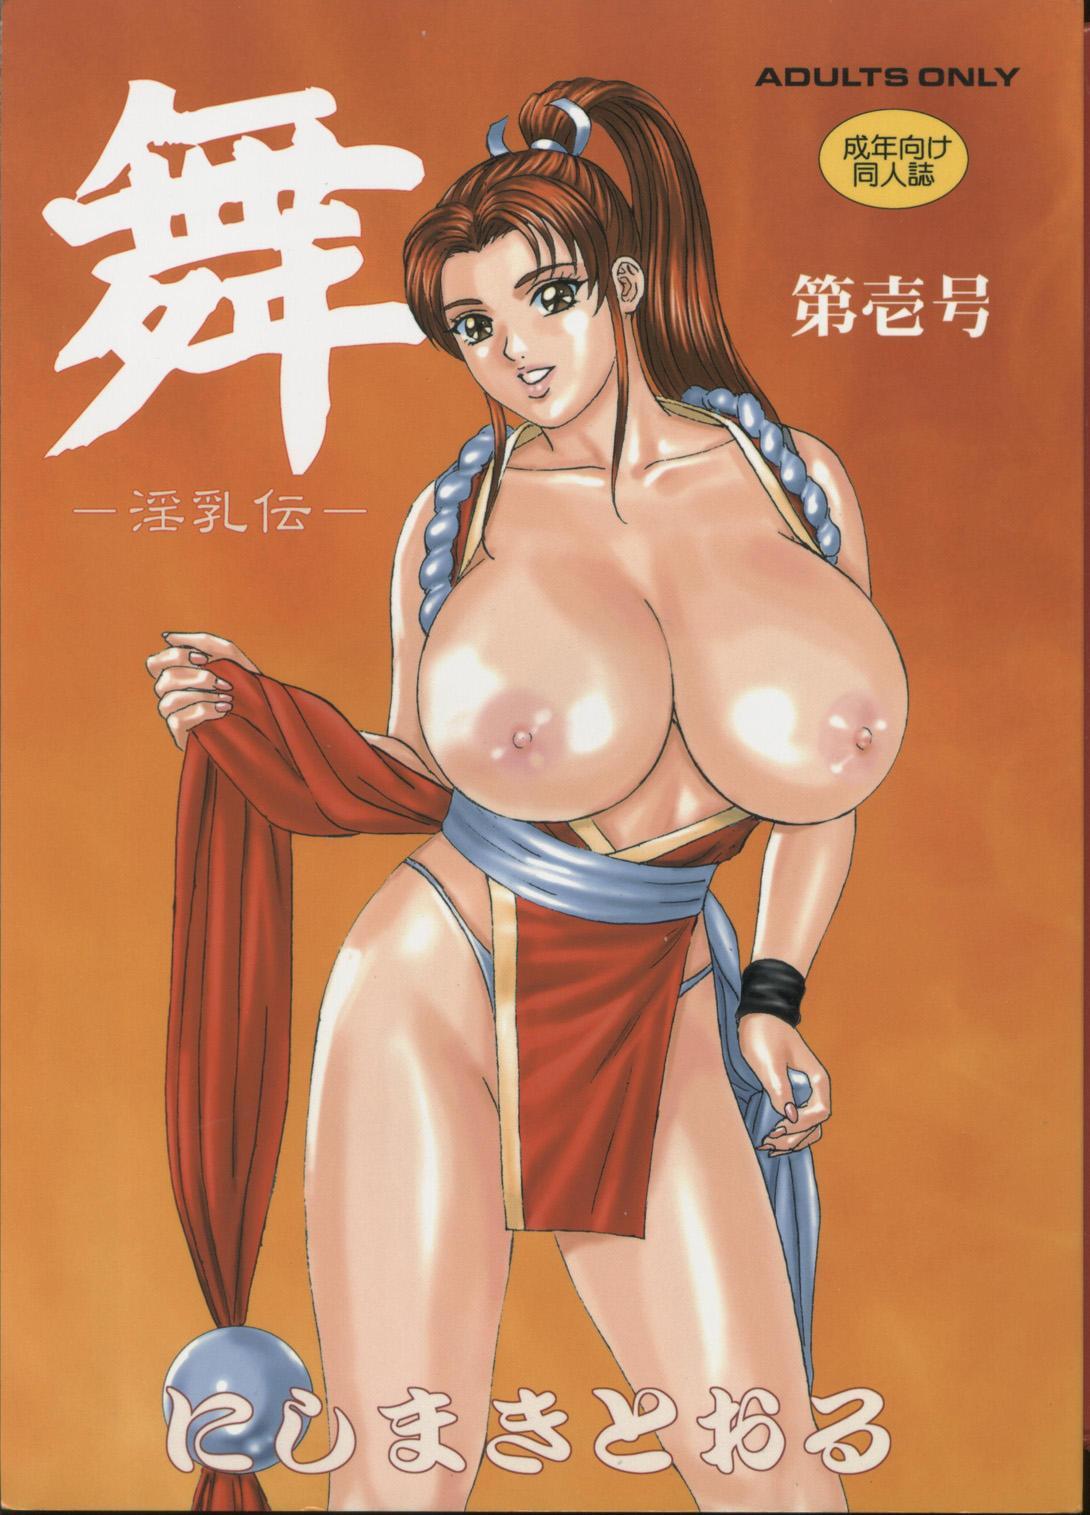 (C60) [D-LOVERS (Nishimaki Tohru)] Mai -Innyuuden- Daiichigou (King of Fighters) 0